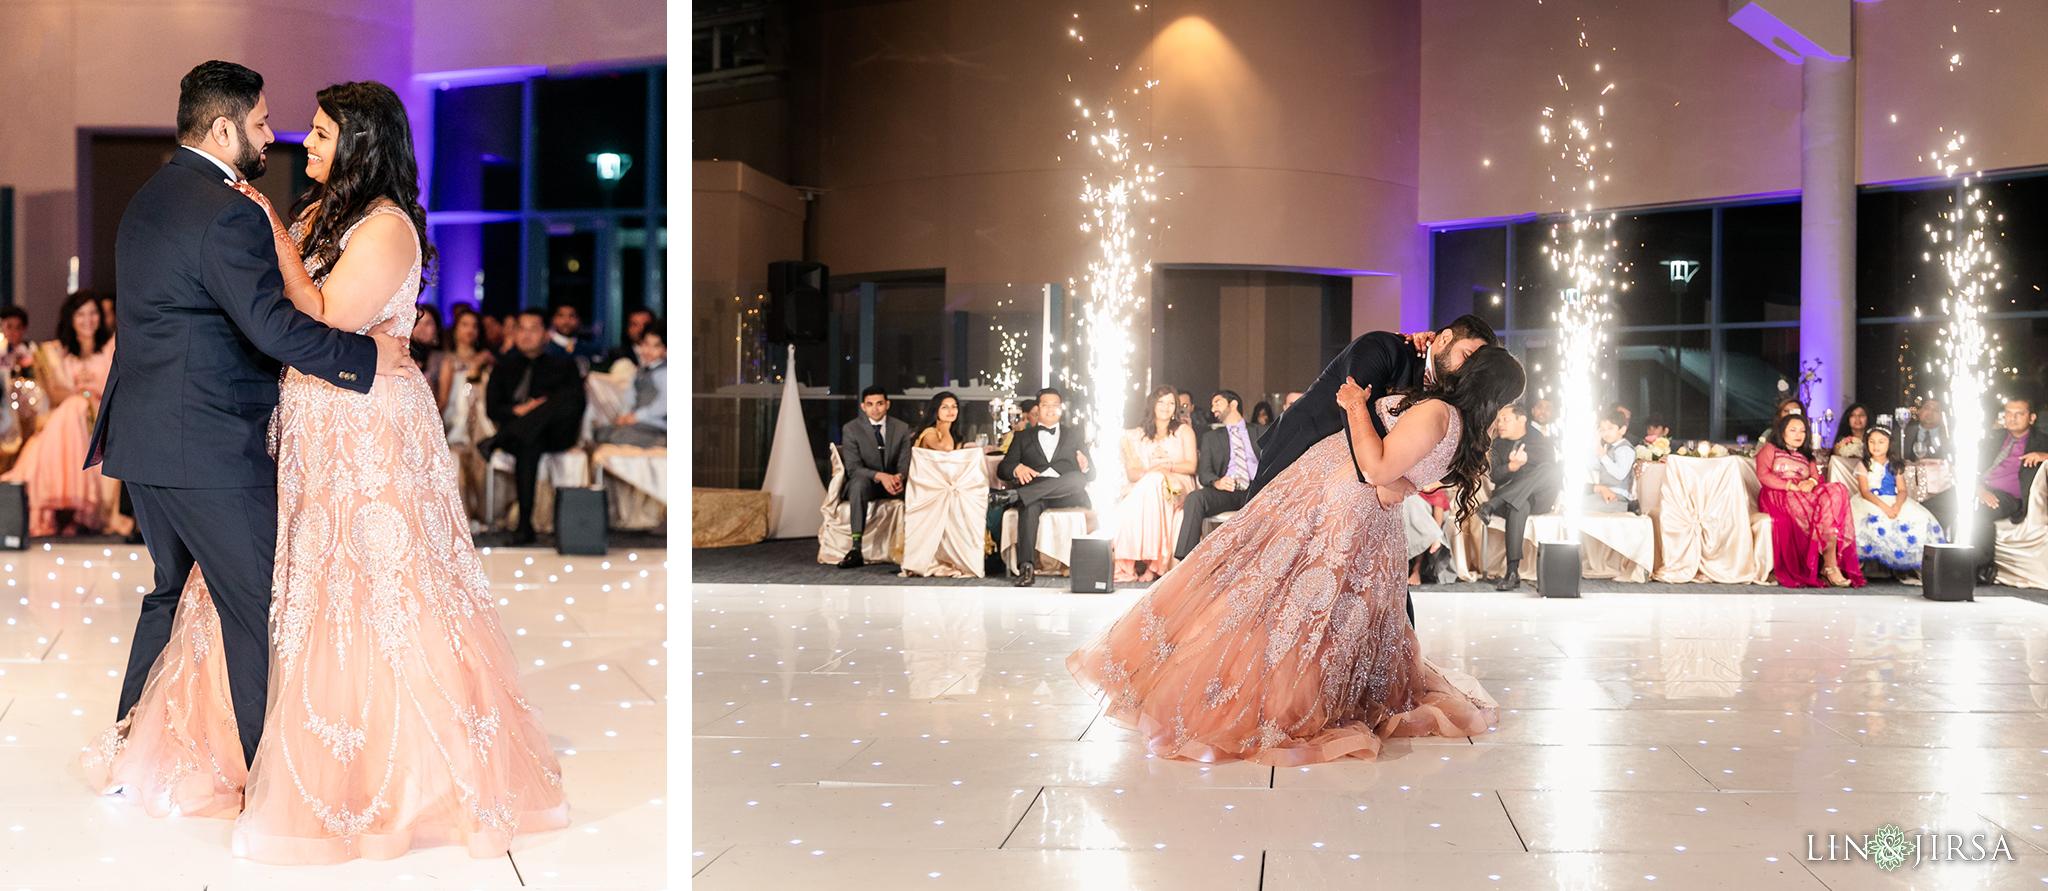 43 Delta Hotels Chesapeake Norfolk Virginia Indian Wedding Photography